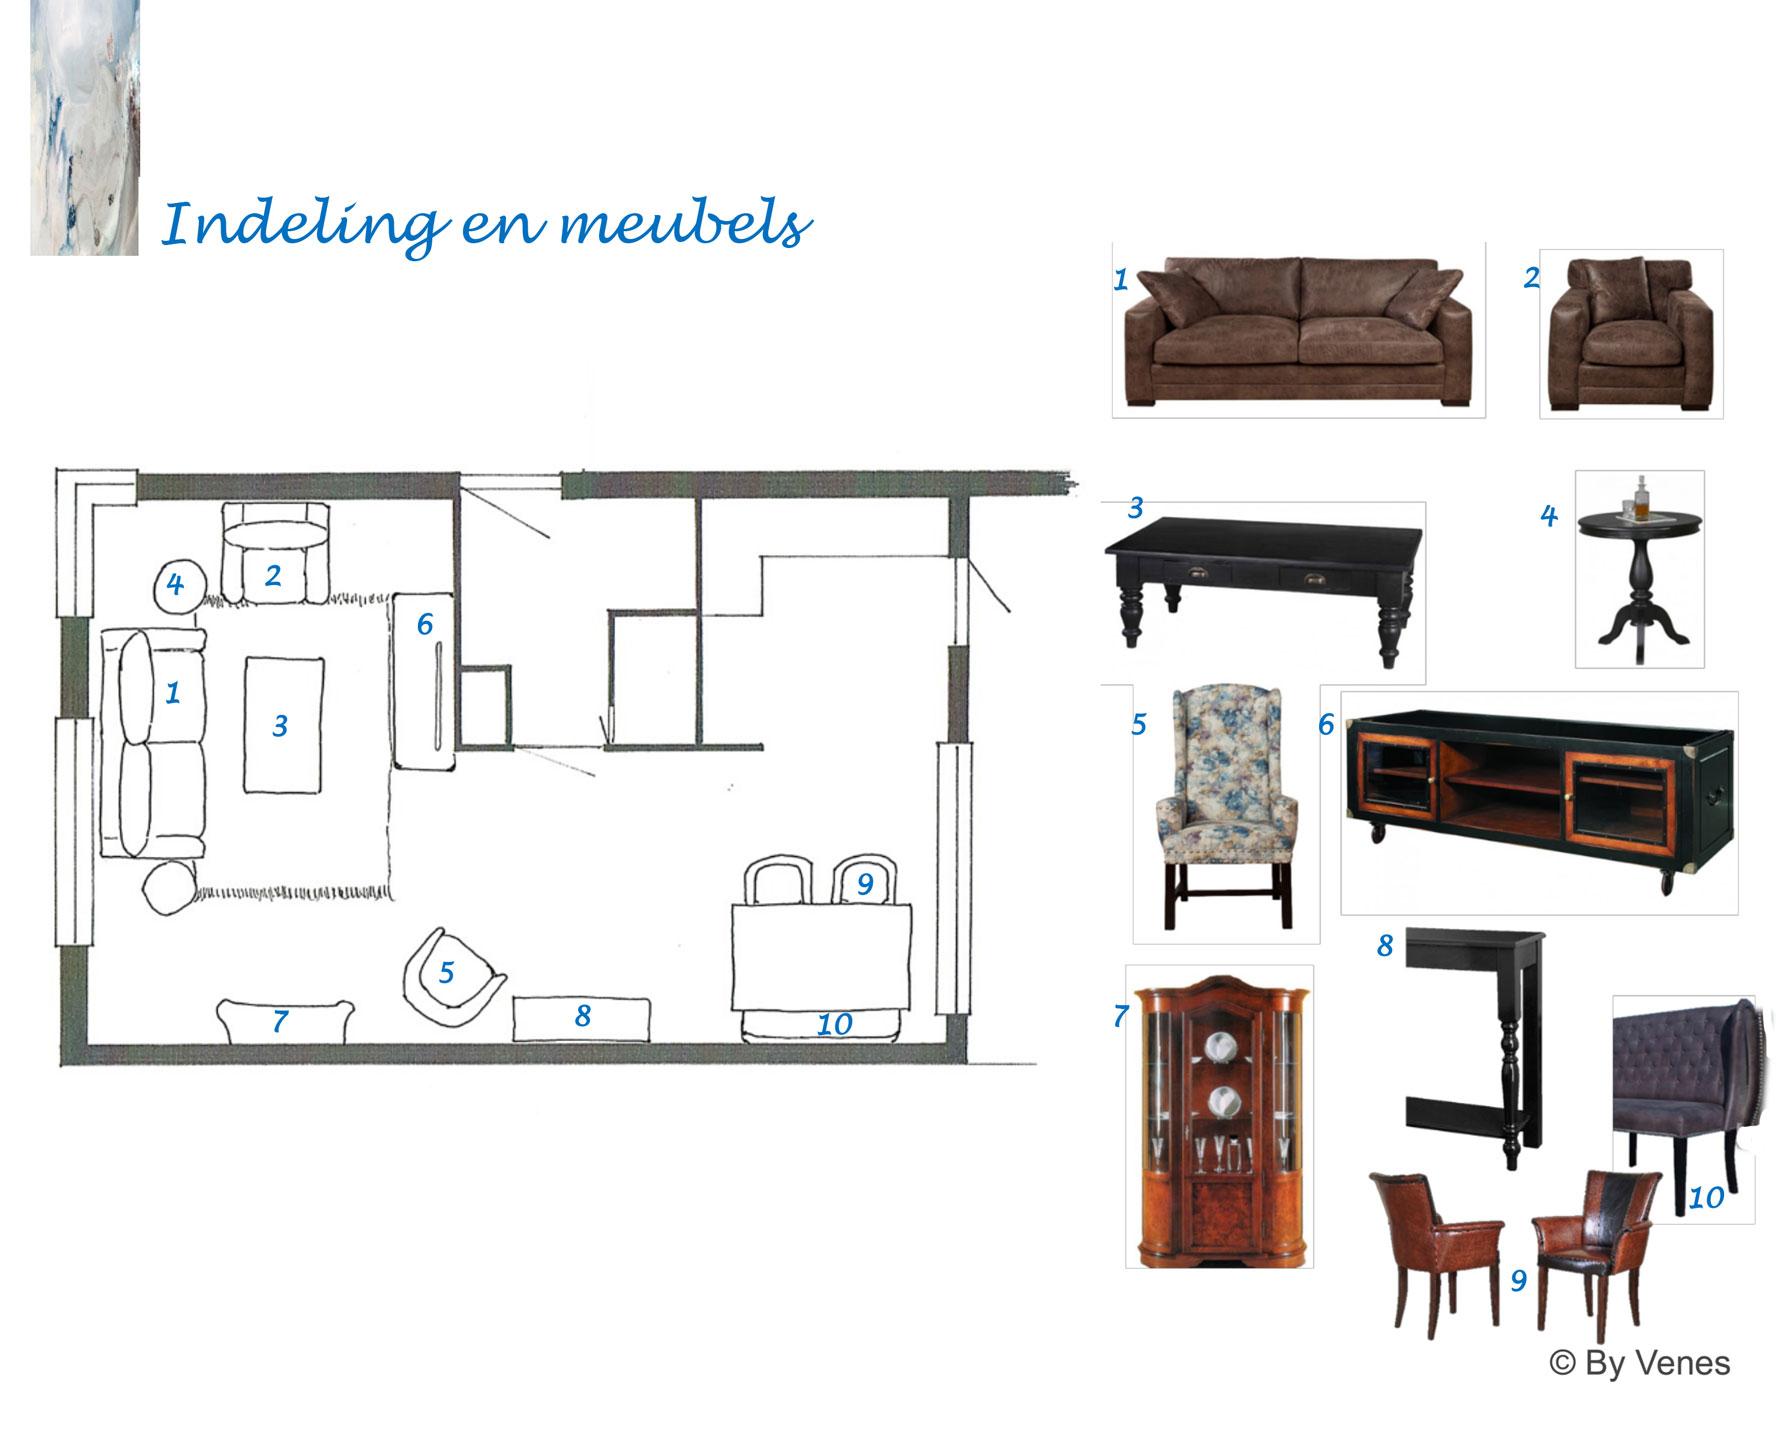 Indelingsplan en meubeladvies woonkamer Heerlen